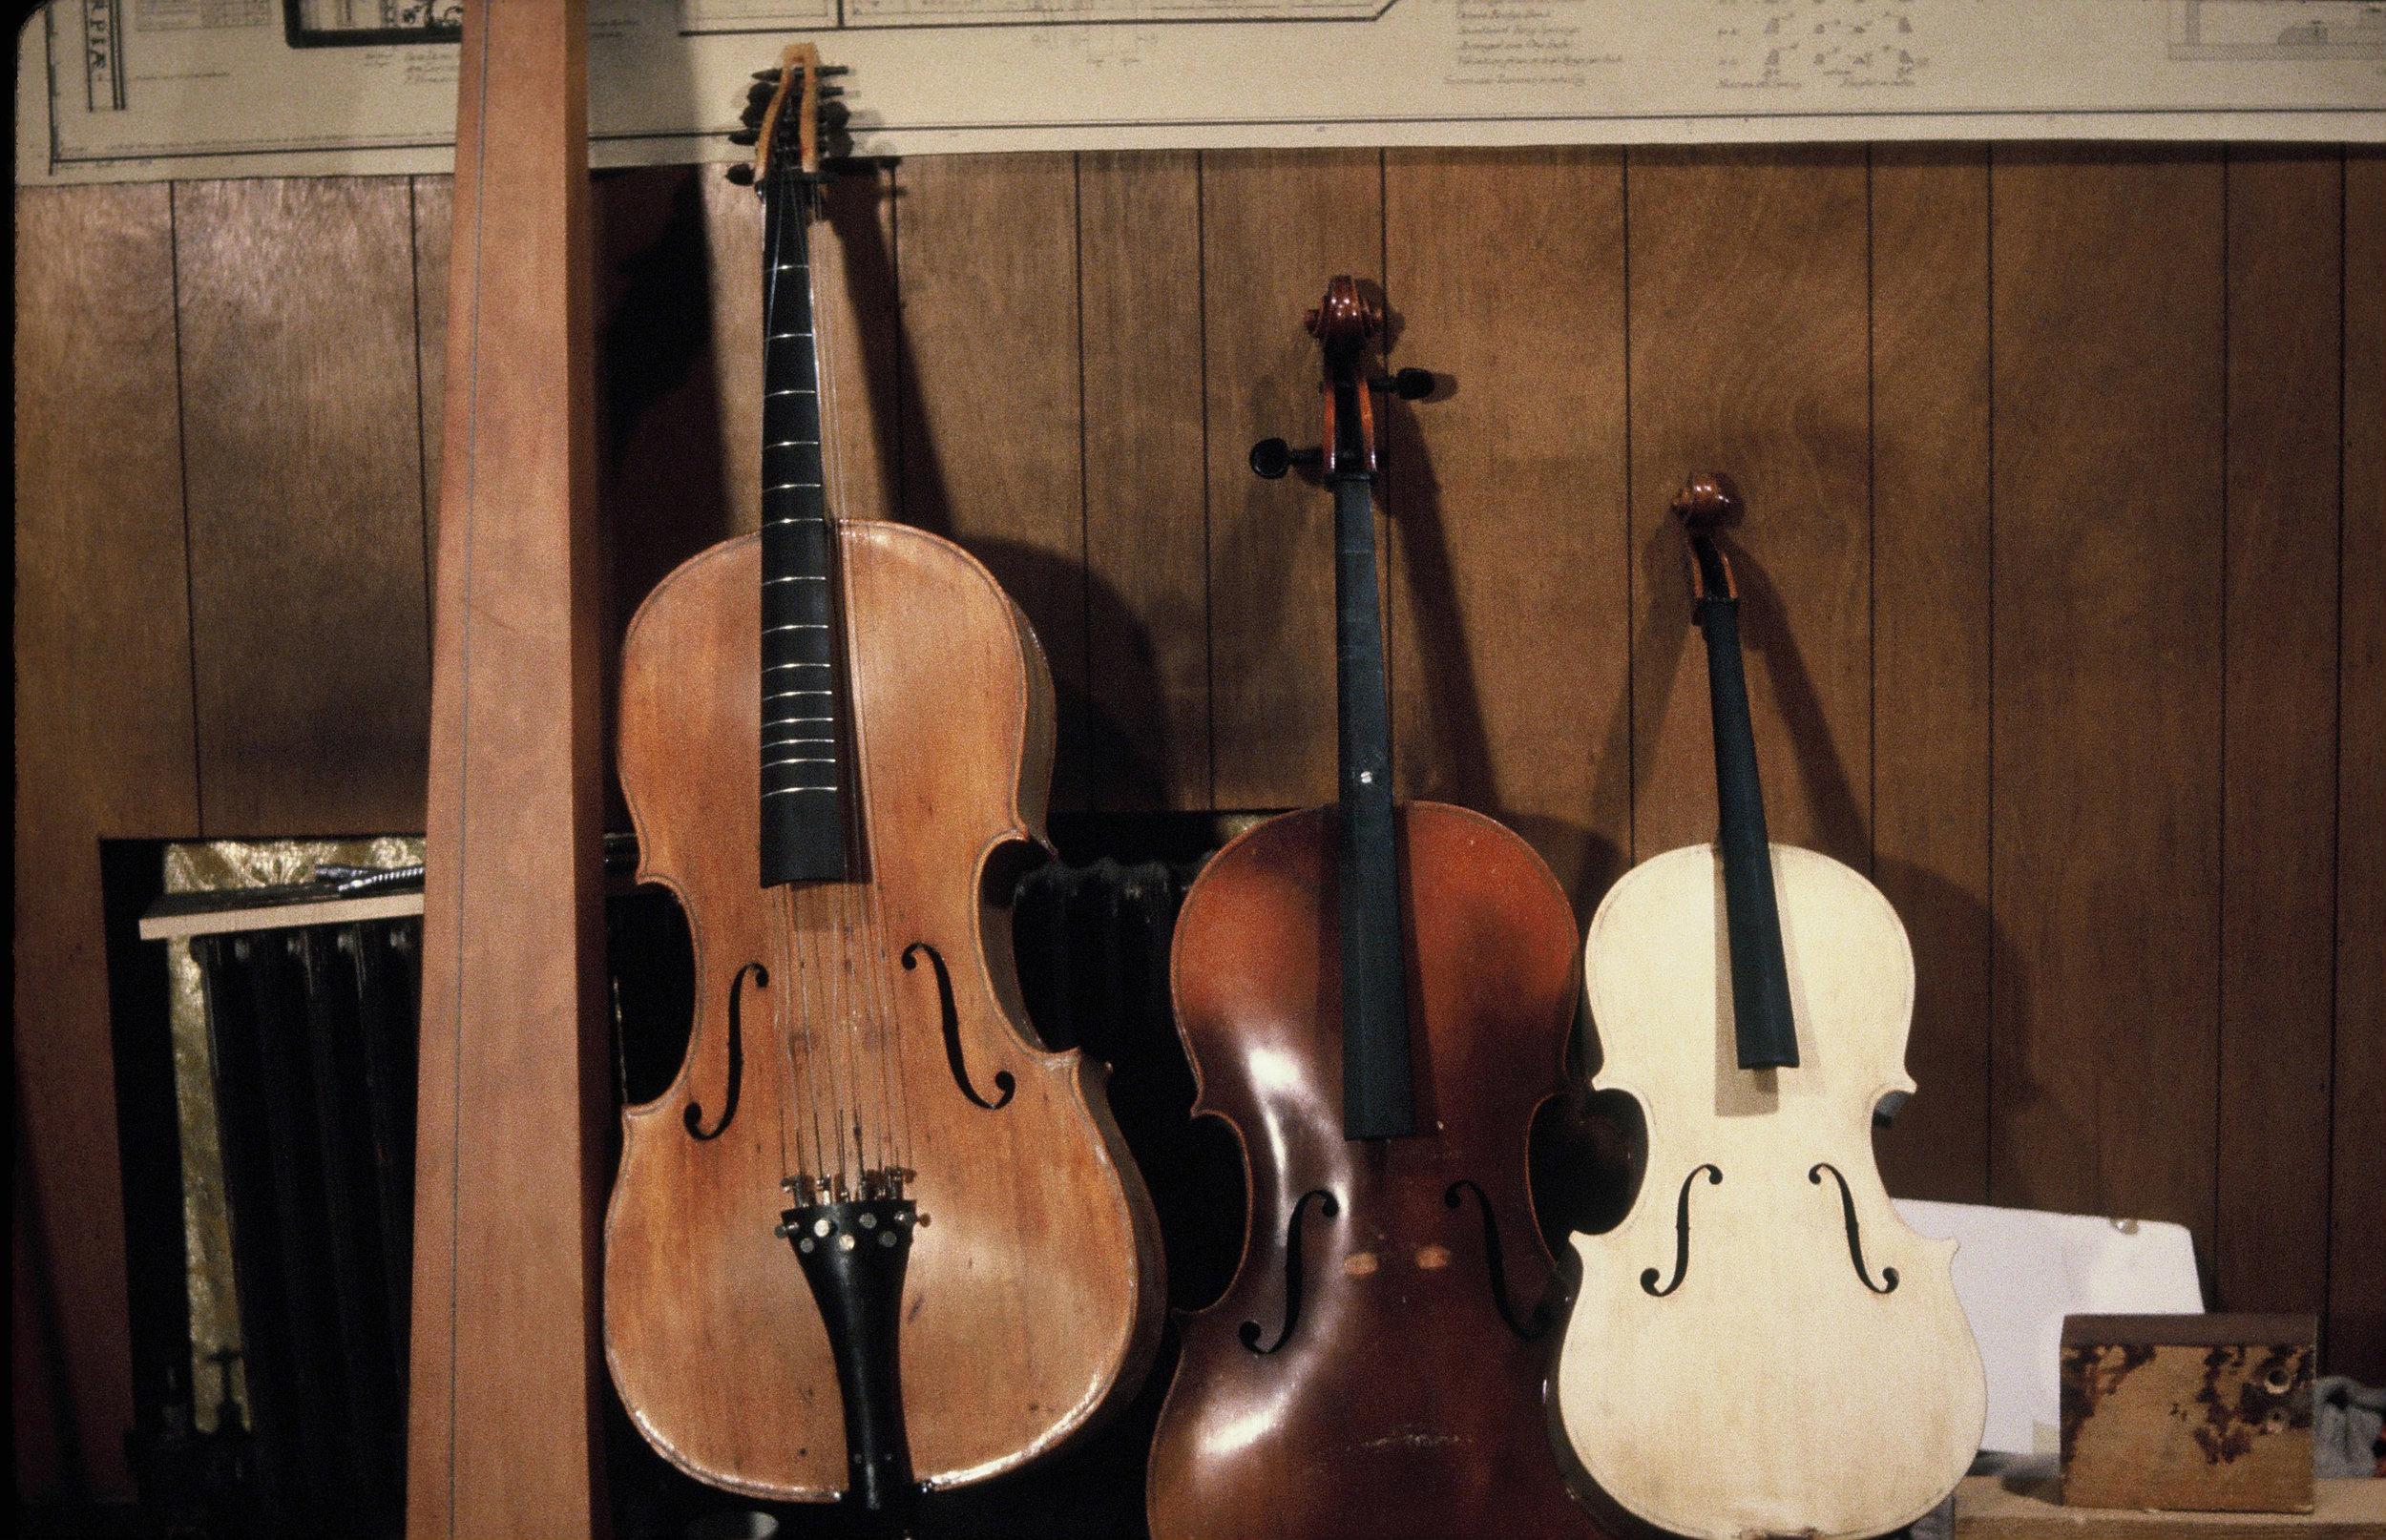 Tomba Marina, Cellos with Metal Frets in development, Brooklyn Docks Studio, 1982